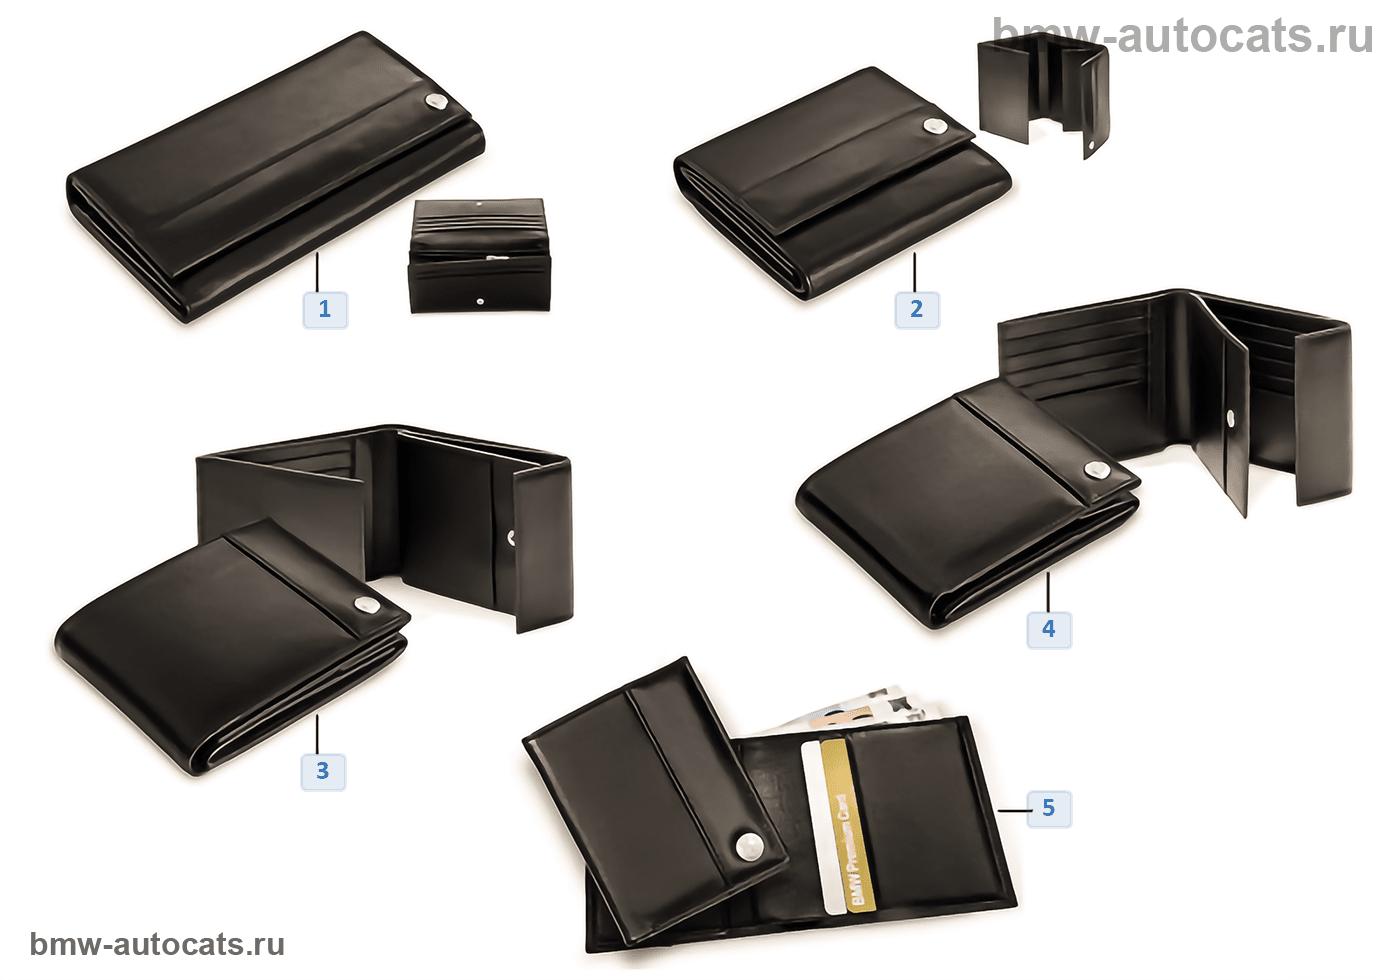 BMW Collection — бумажники 2012/13